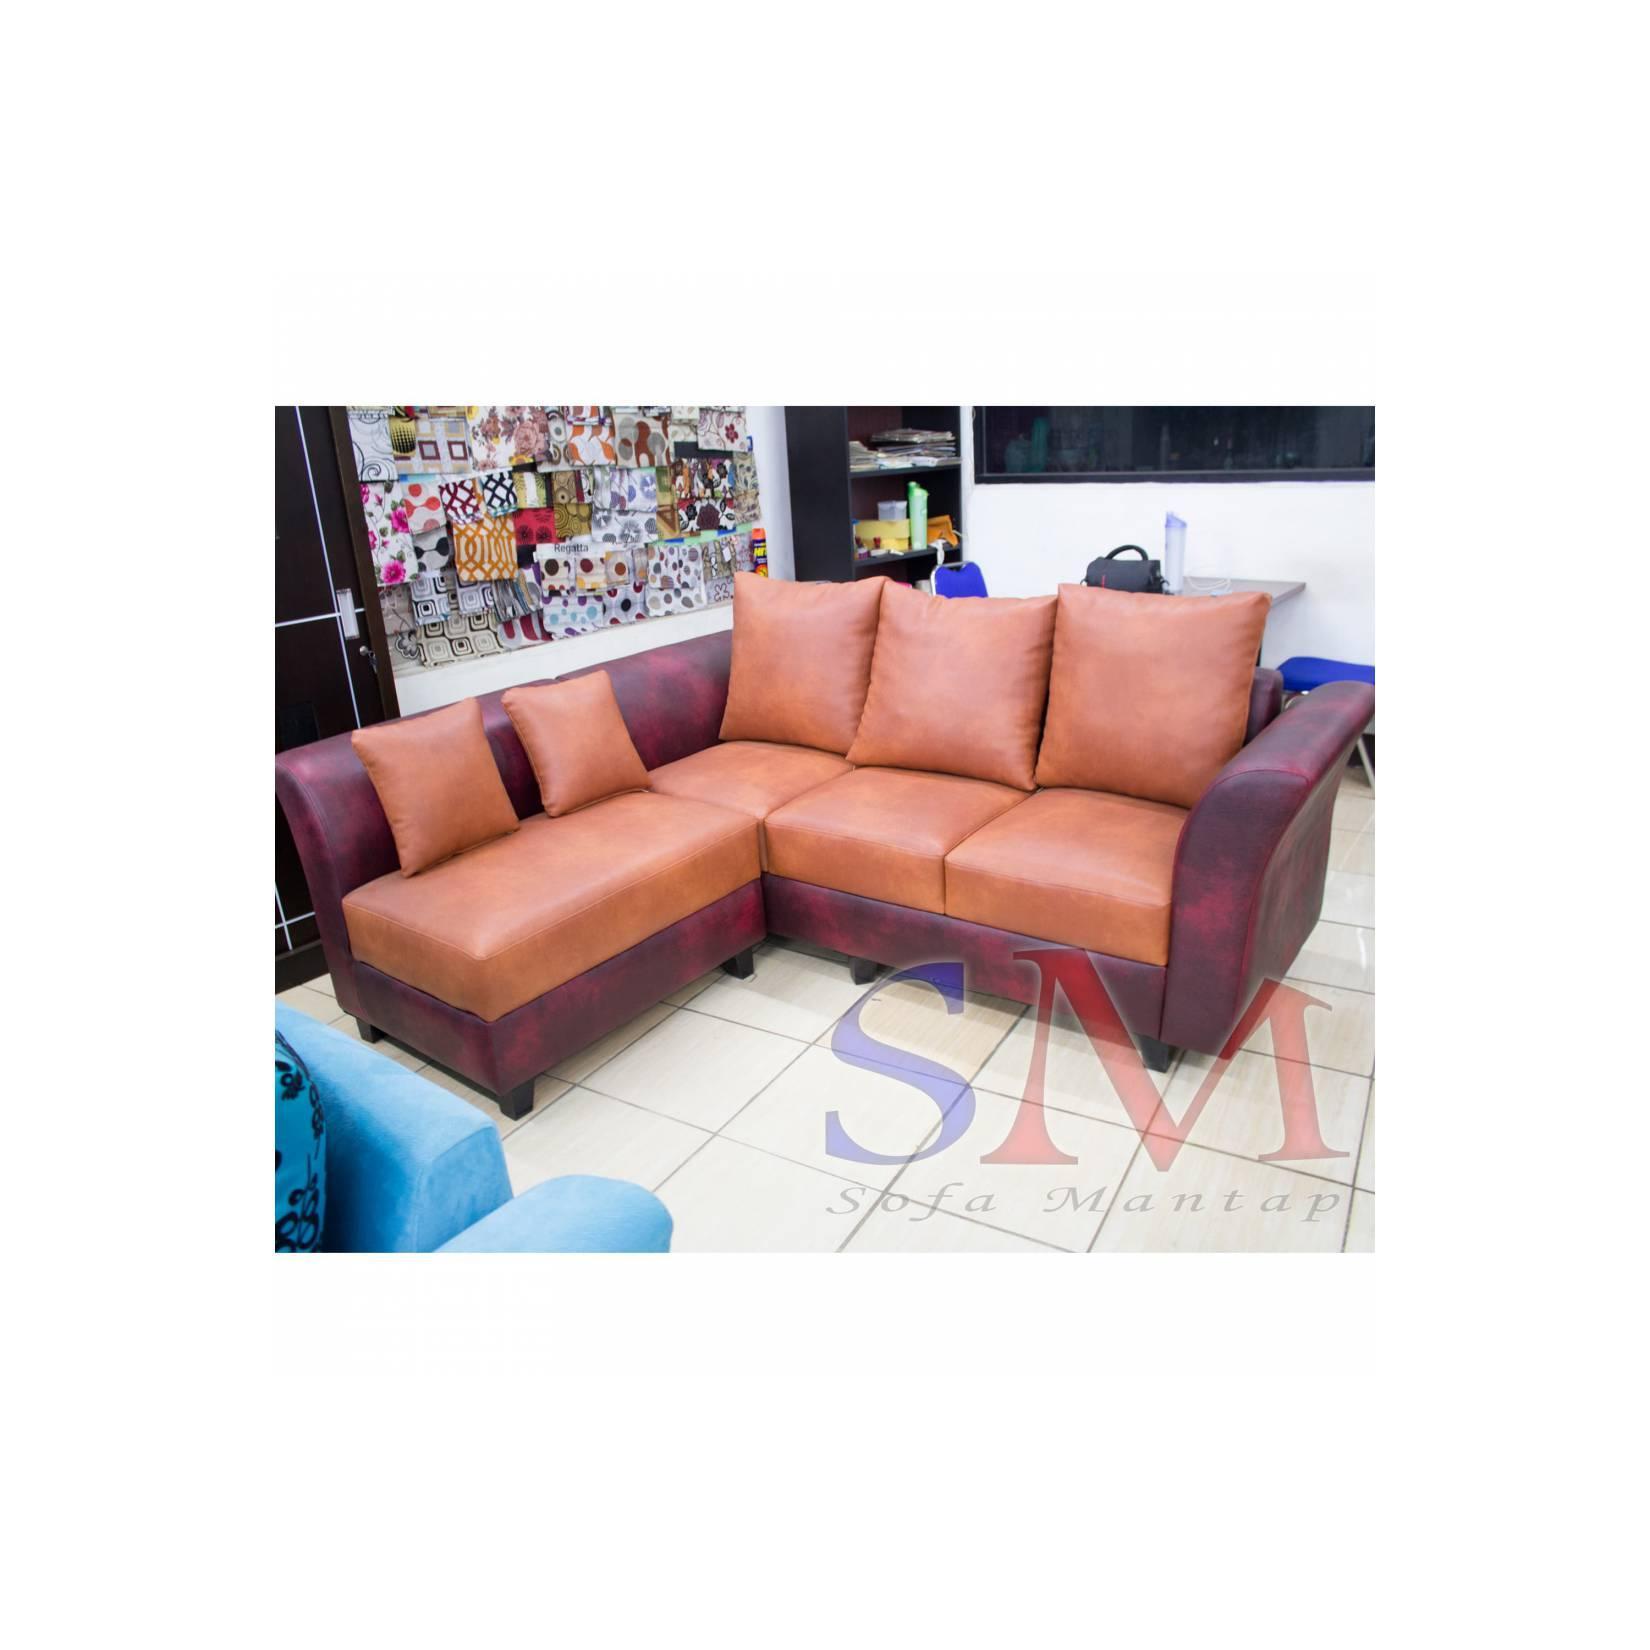 Sofa kursi ruang Tamu Minimalis mewah, sofa sudut kantor modern + MEJA